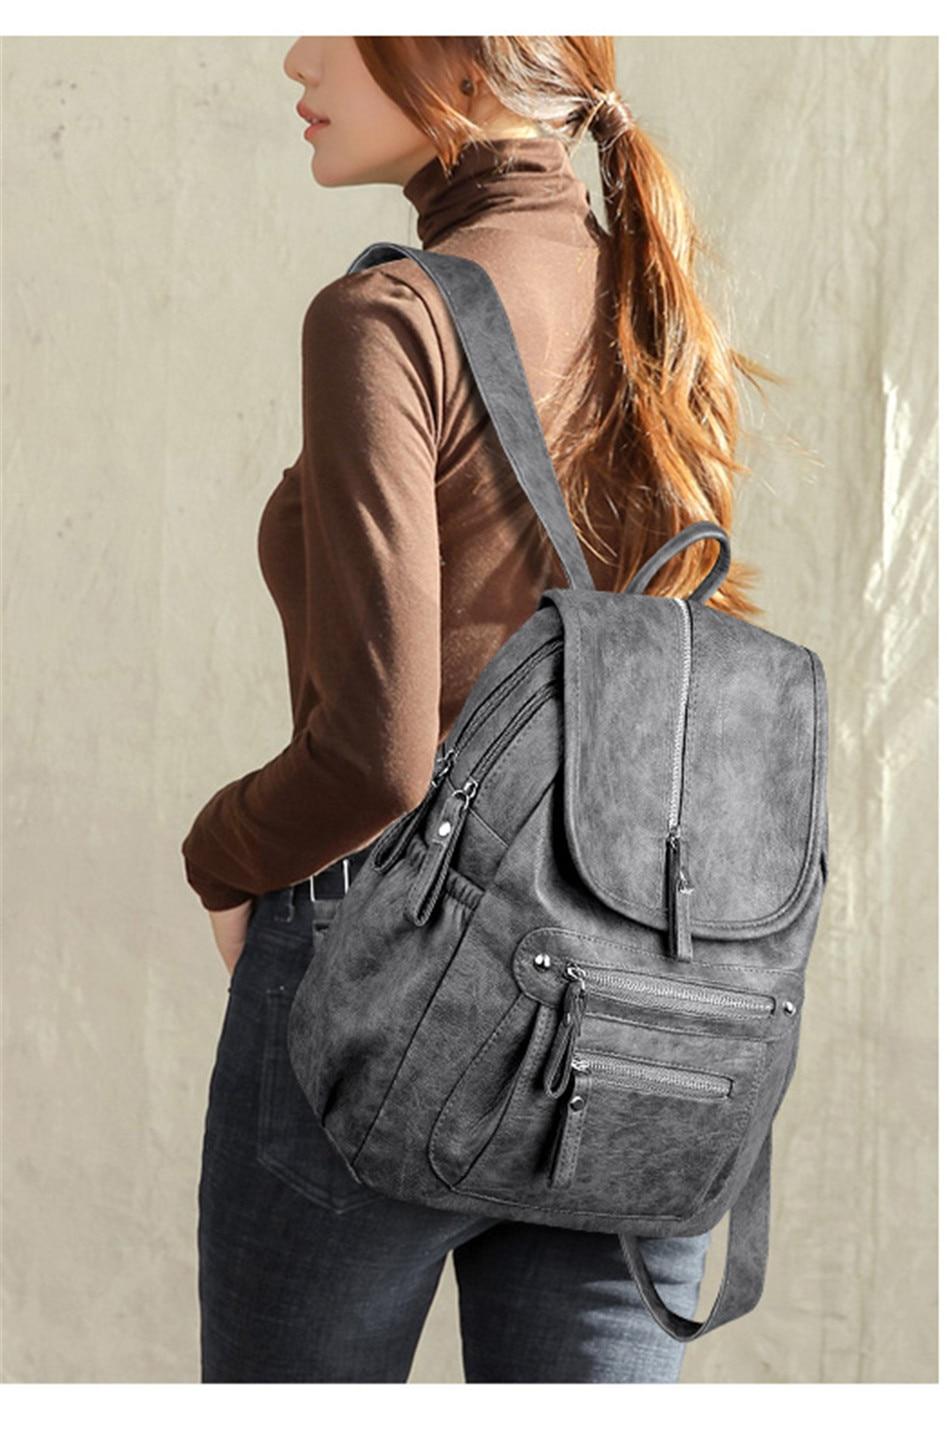 HTB1vKtMaIvrK1Rjy0Feq6ATmVXaV Women Backpack Female High Quality Soft Leather Book School Bags For Teenage Girls Sac A Dos Travel Back pack Rucksacks Mochilas